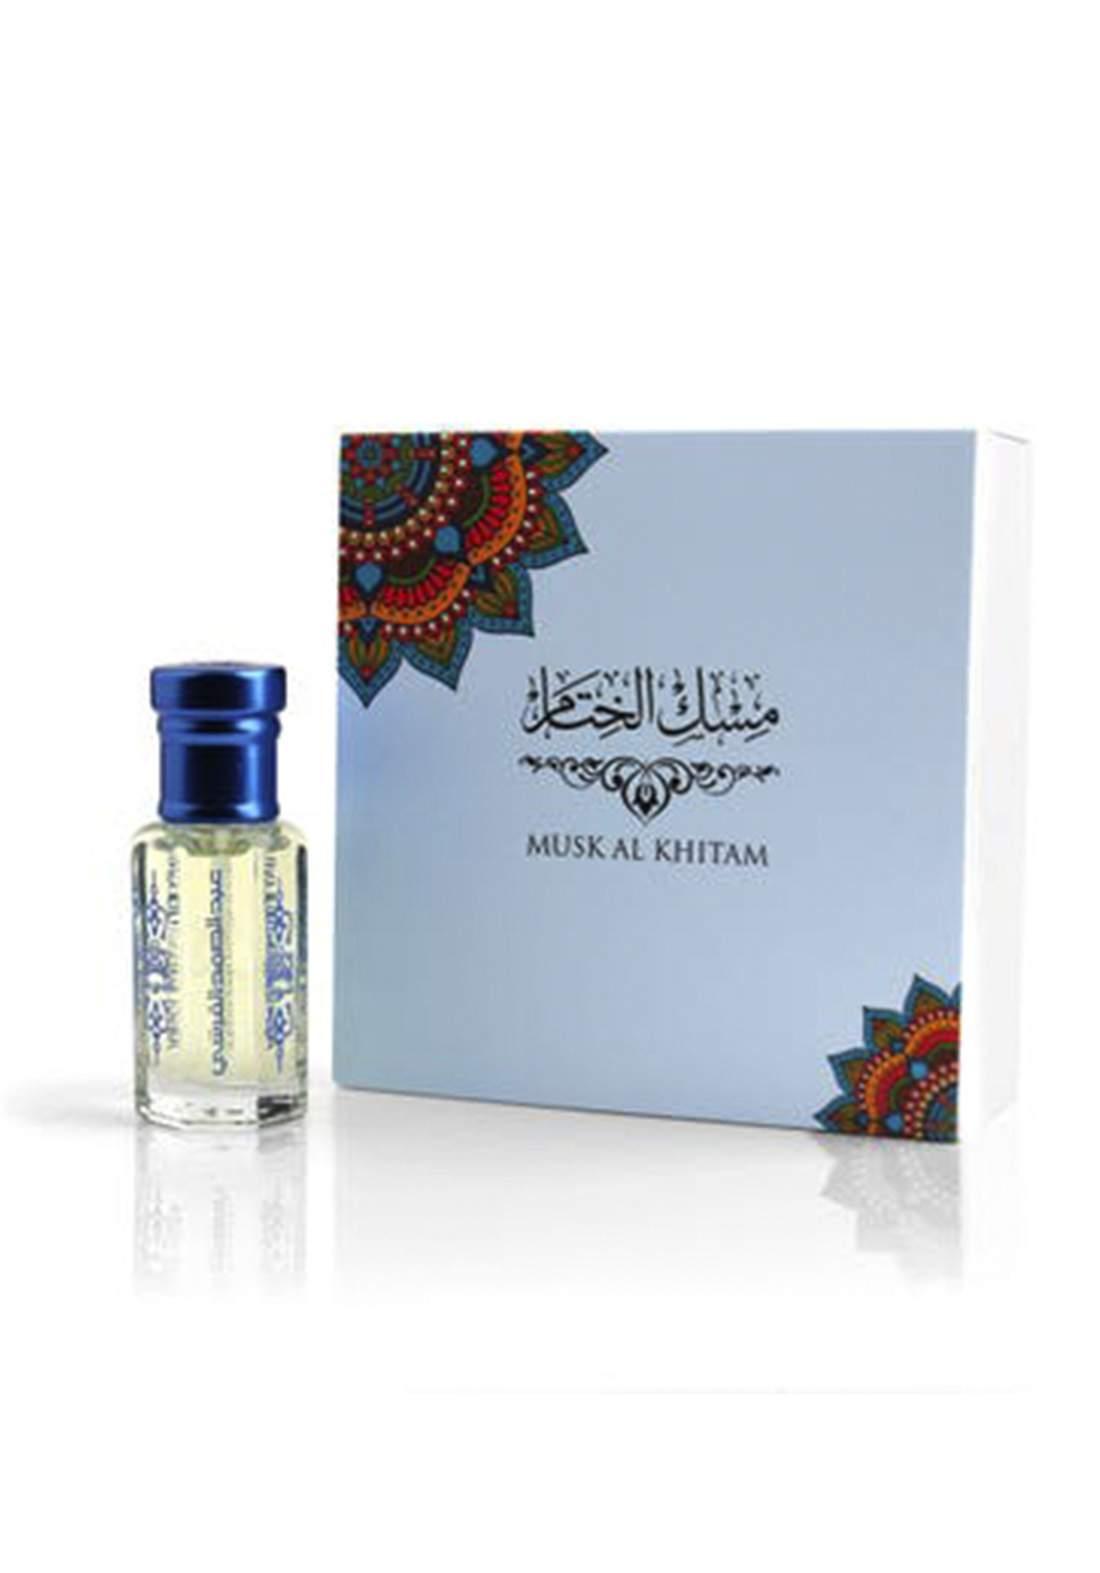 Abdul Samad Al Qurashi 13005 -Hold the ending Mix Perfume Oil 12g  عطر زيتي